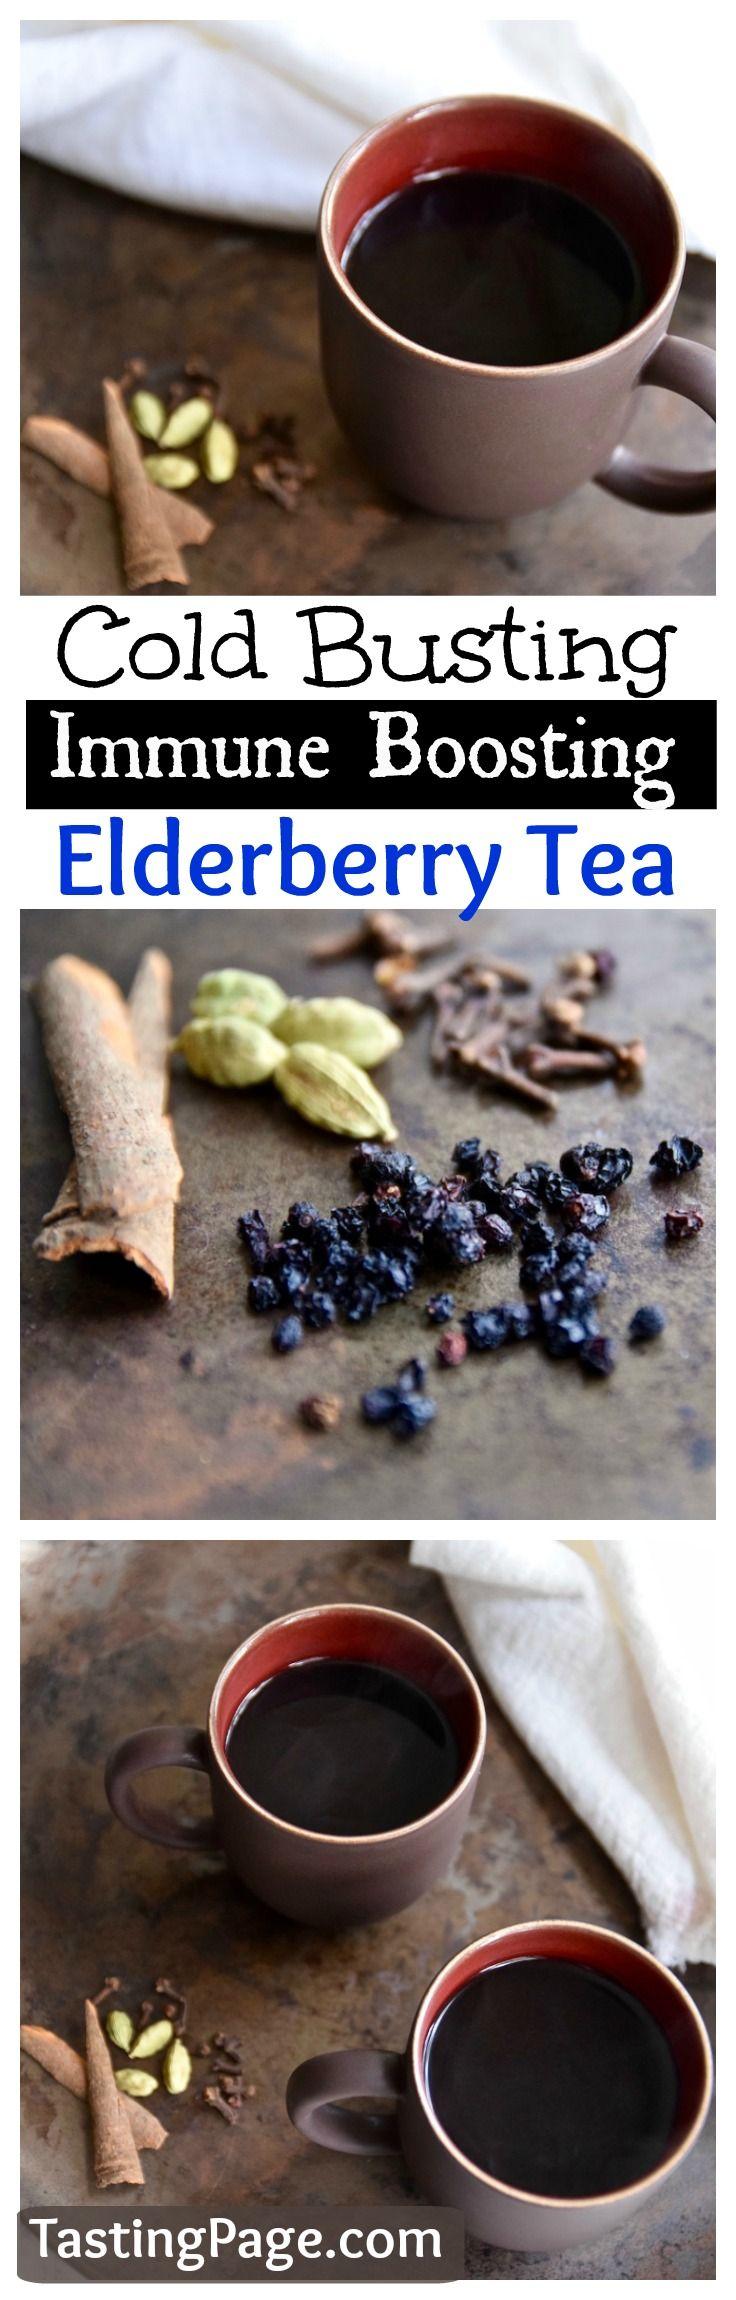 Stay heathy with this cold busting immune boosting elderberry tea | TastingPage.com #elderberry #tea #immunebooster